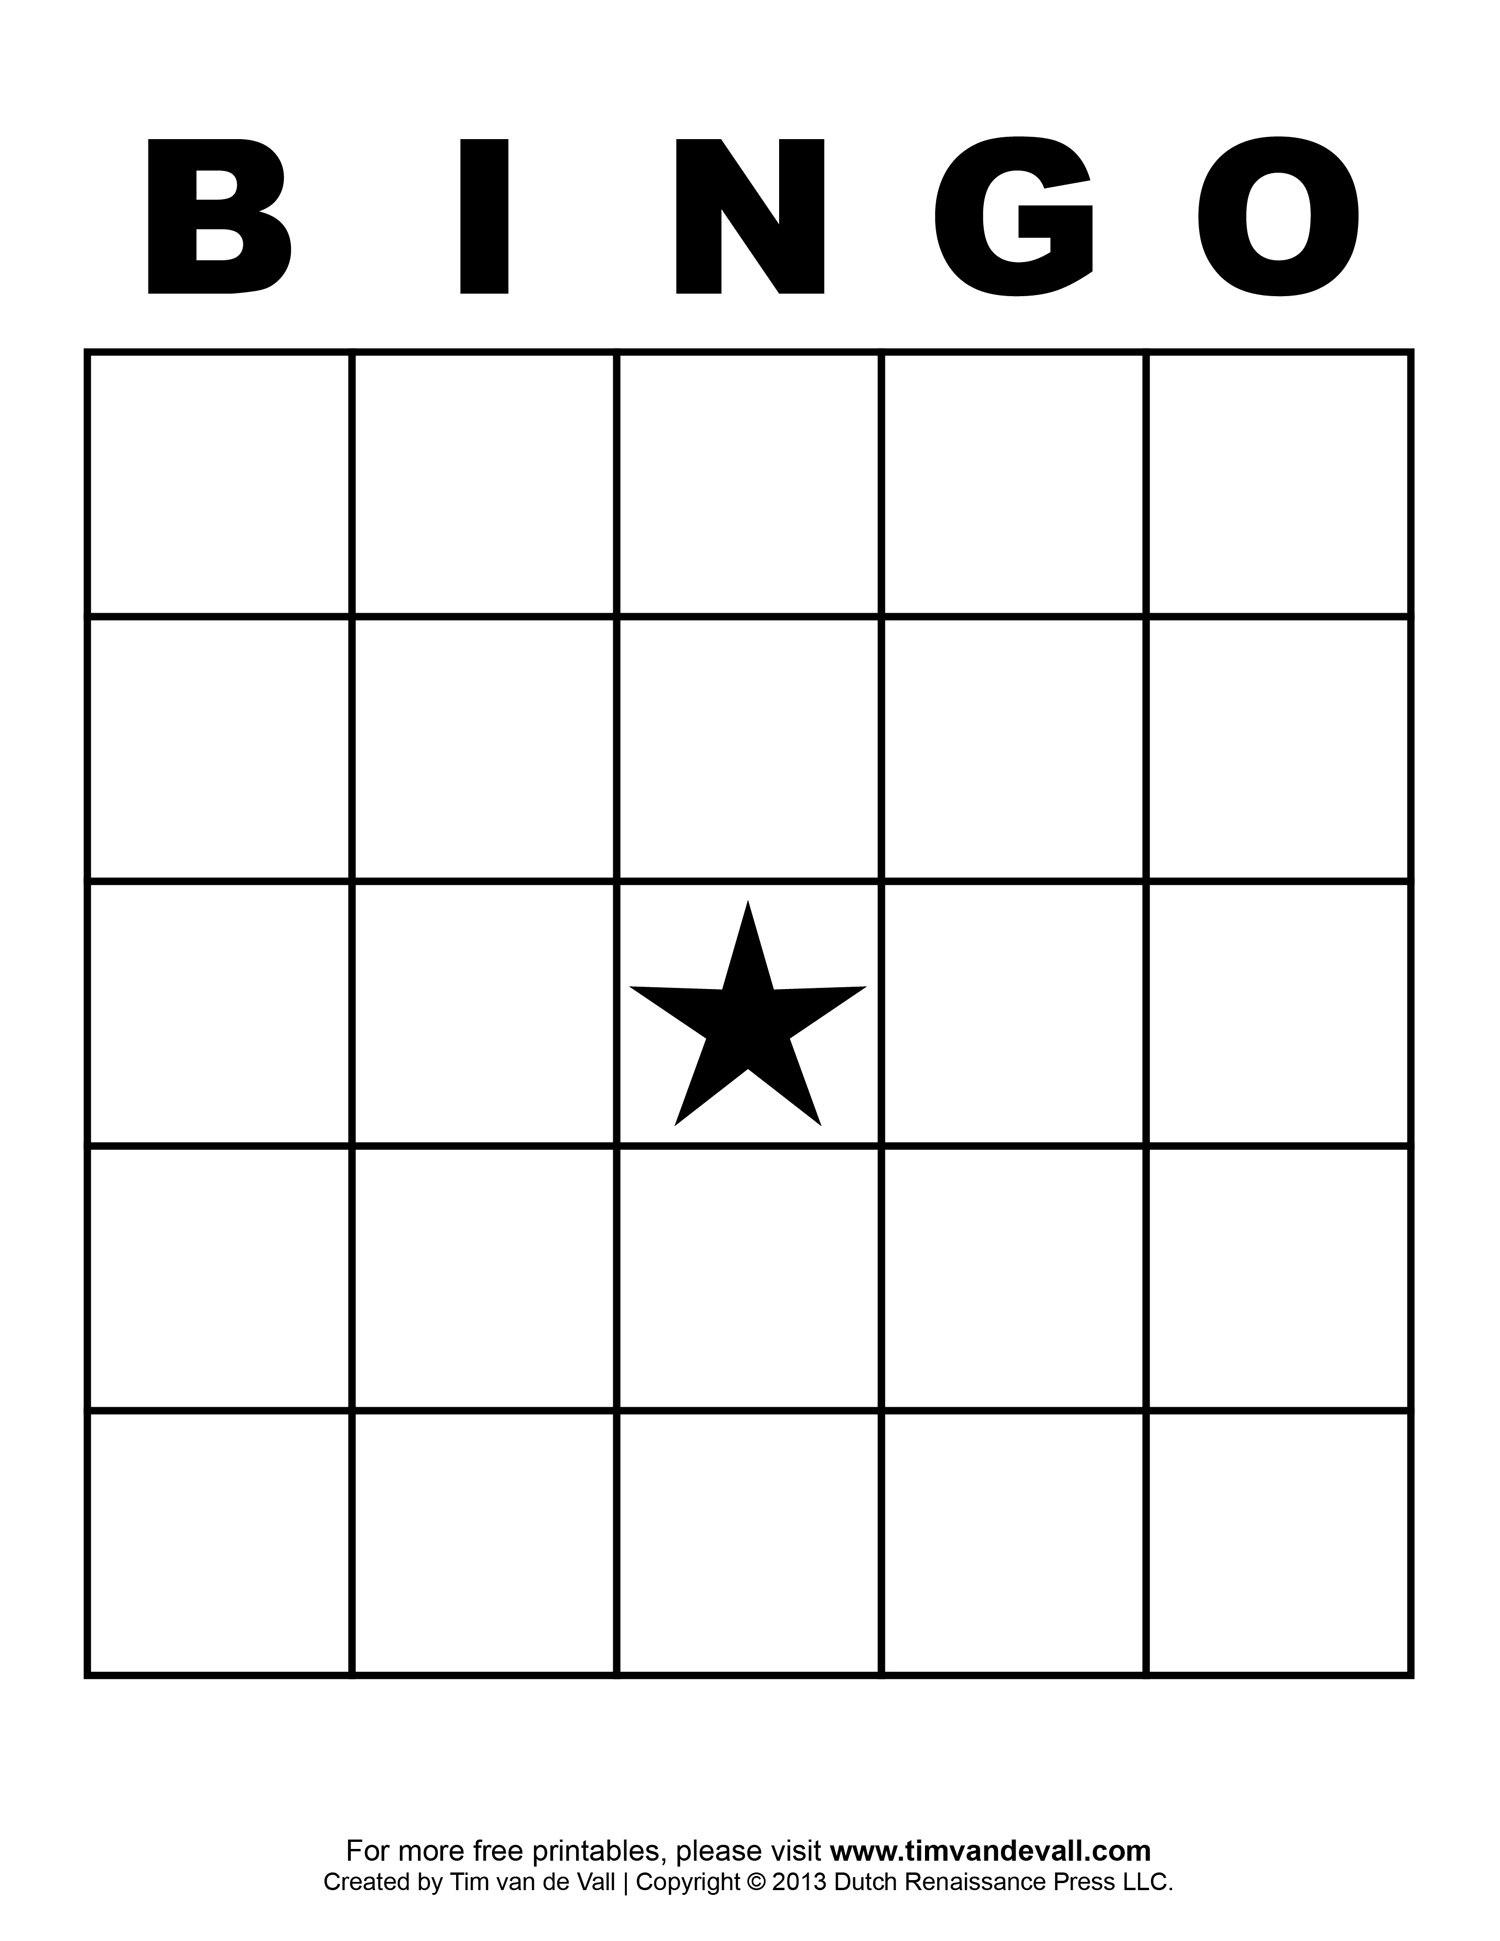 Blank Bingo Template  Tim's Printables With Bingo Card Template Word